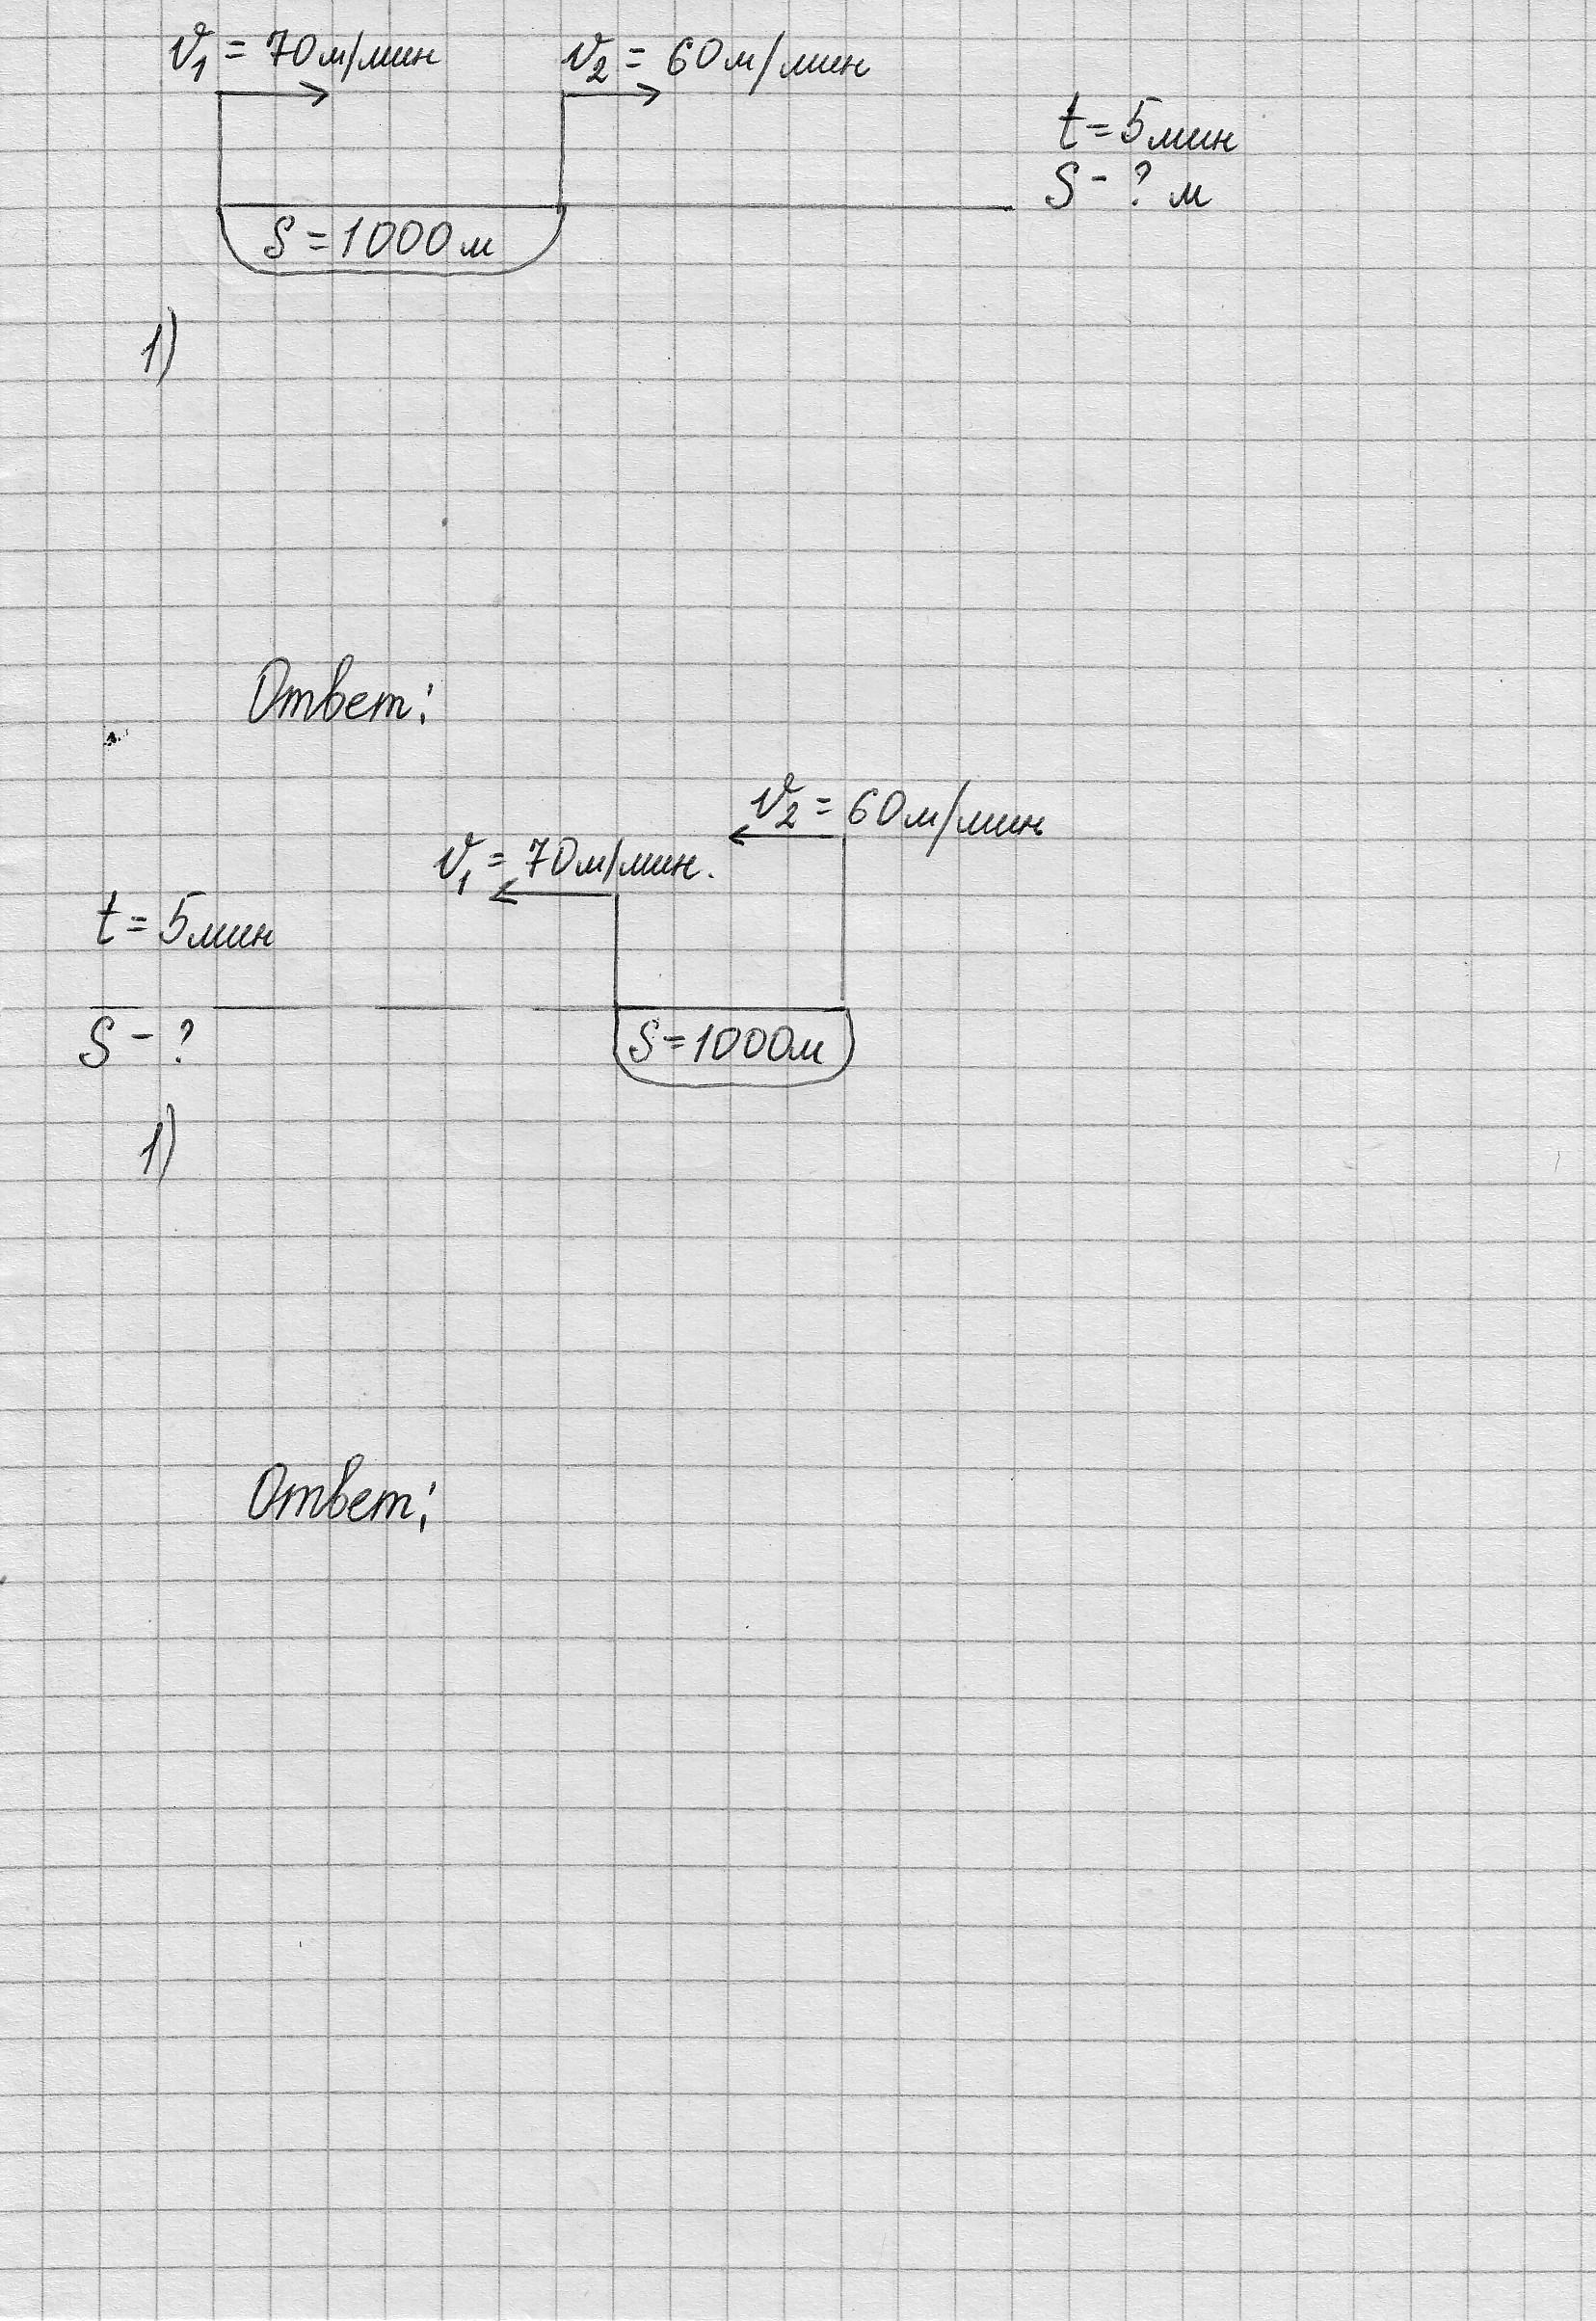 D:\мама\ШКОЛА\4 класс\математика\открытый урок\Untitled-Scanned-02.jpg